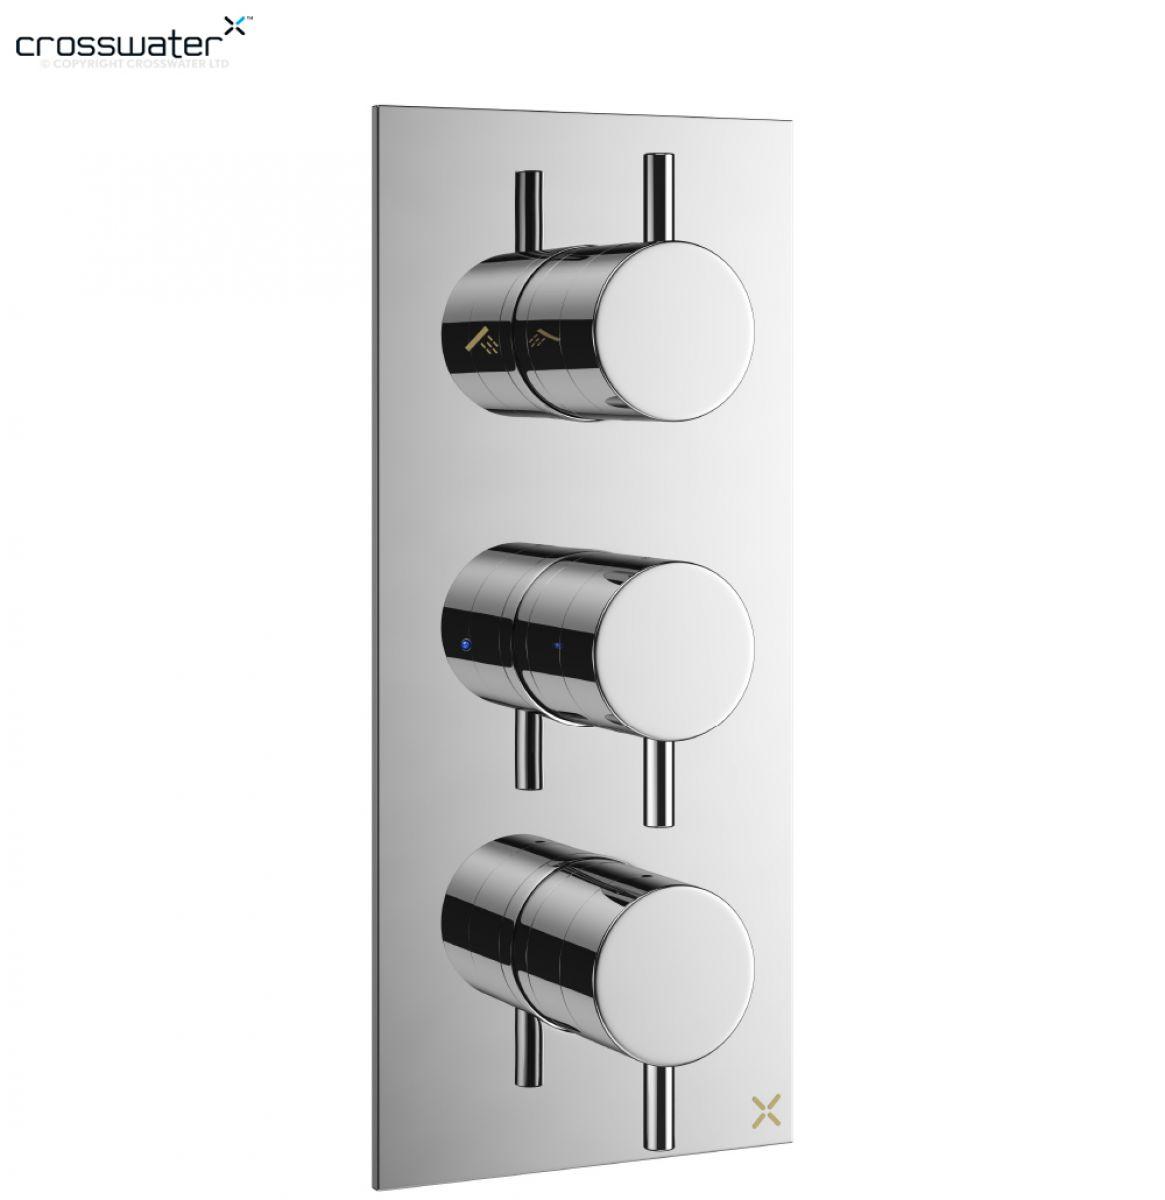 Crosswater MPRO Thermostatic Shower Valve 3 Controls